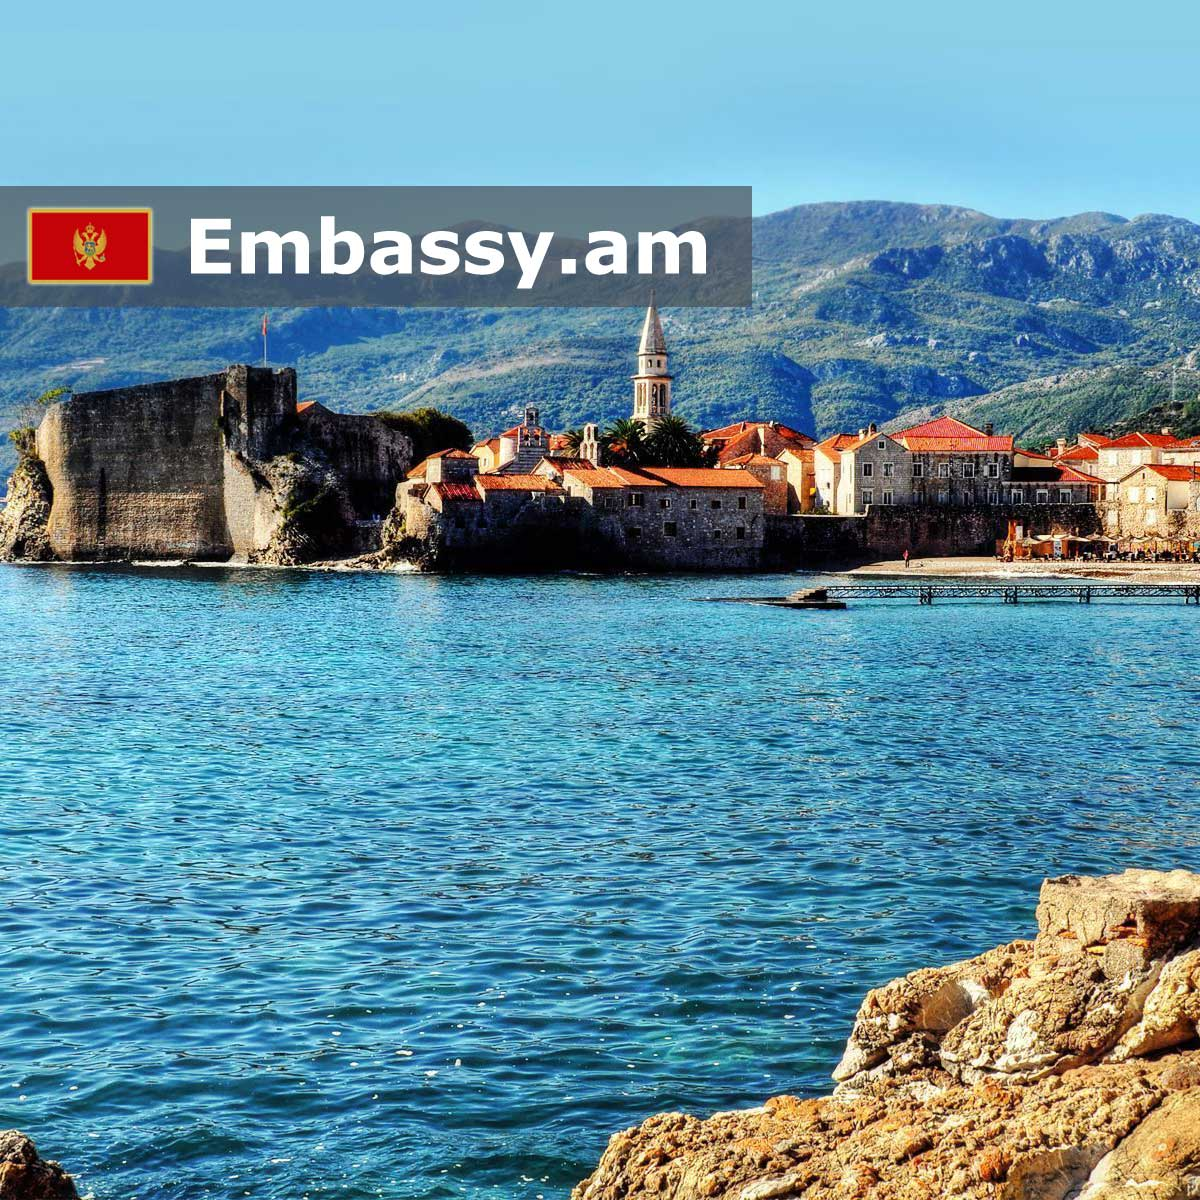 Budva - Hotels in Montenegro - Embassy.am